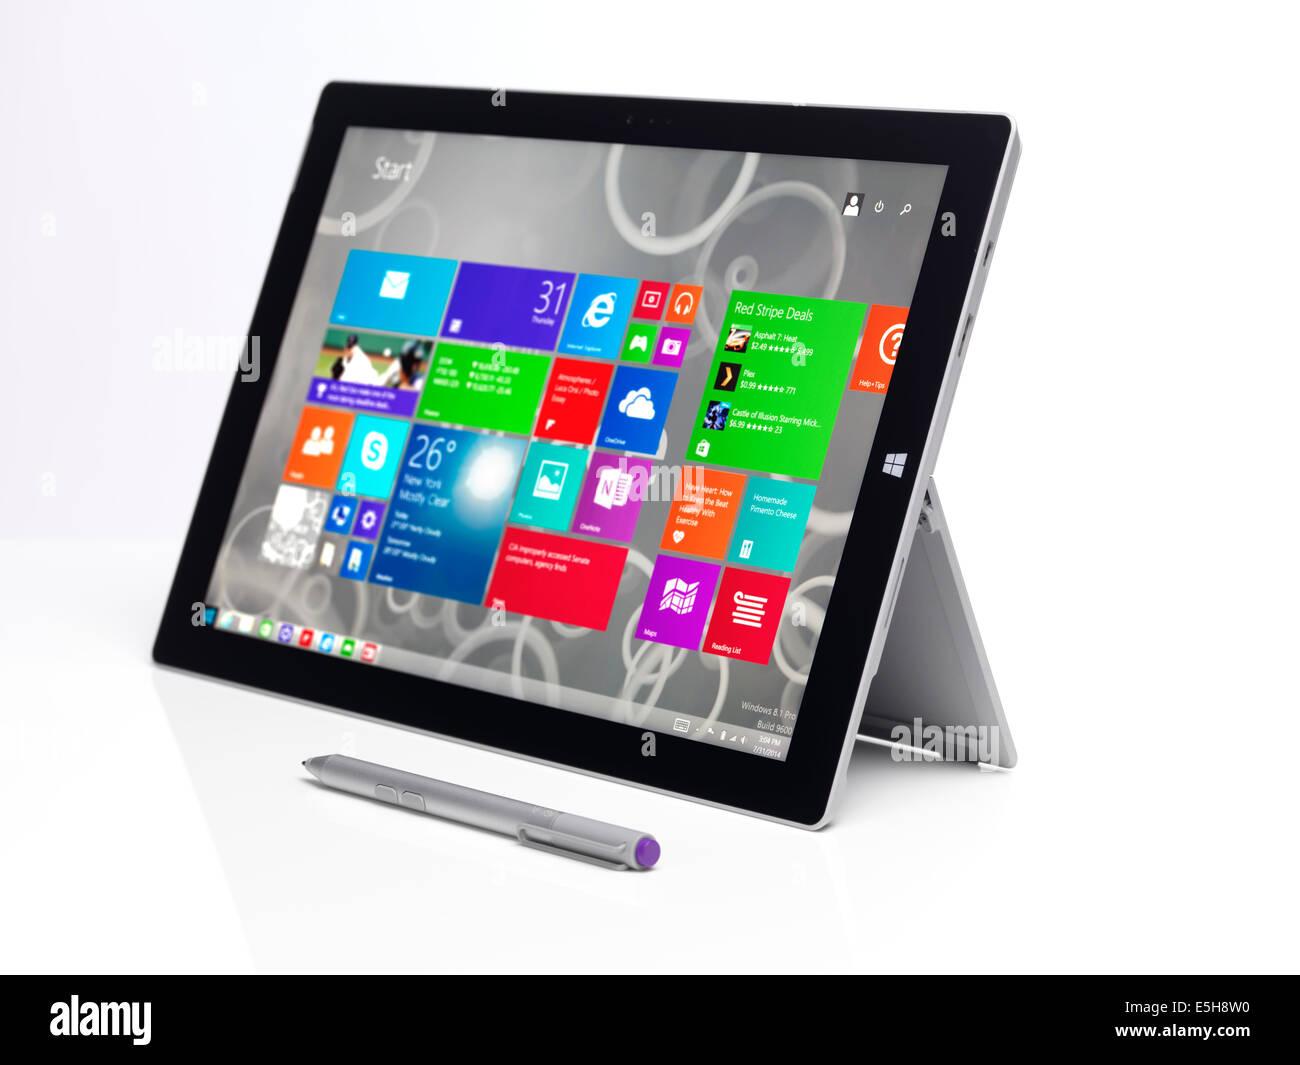 Microsoft Surface Pro 3 tablet PC con Windows 8 Pantalla de inicio en la pantalla aislado sobre fondo blanco. Imagen De Stock